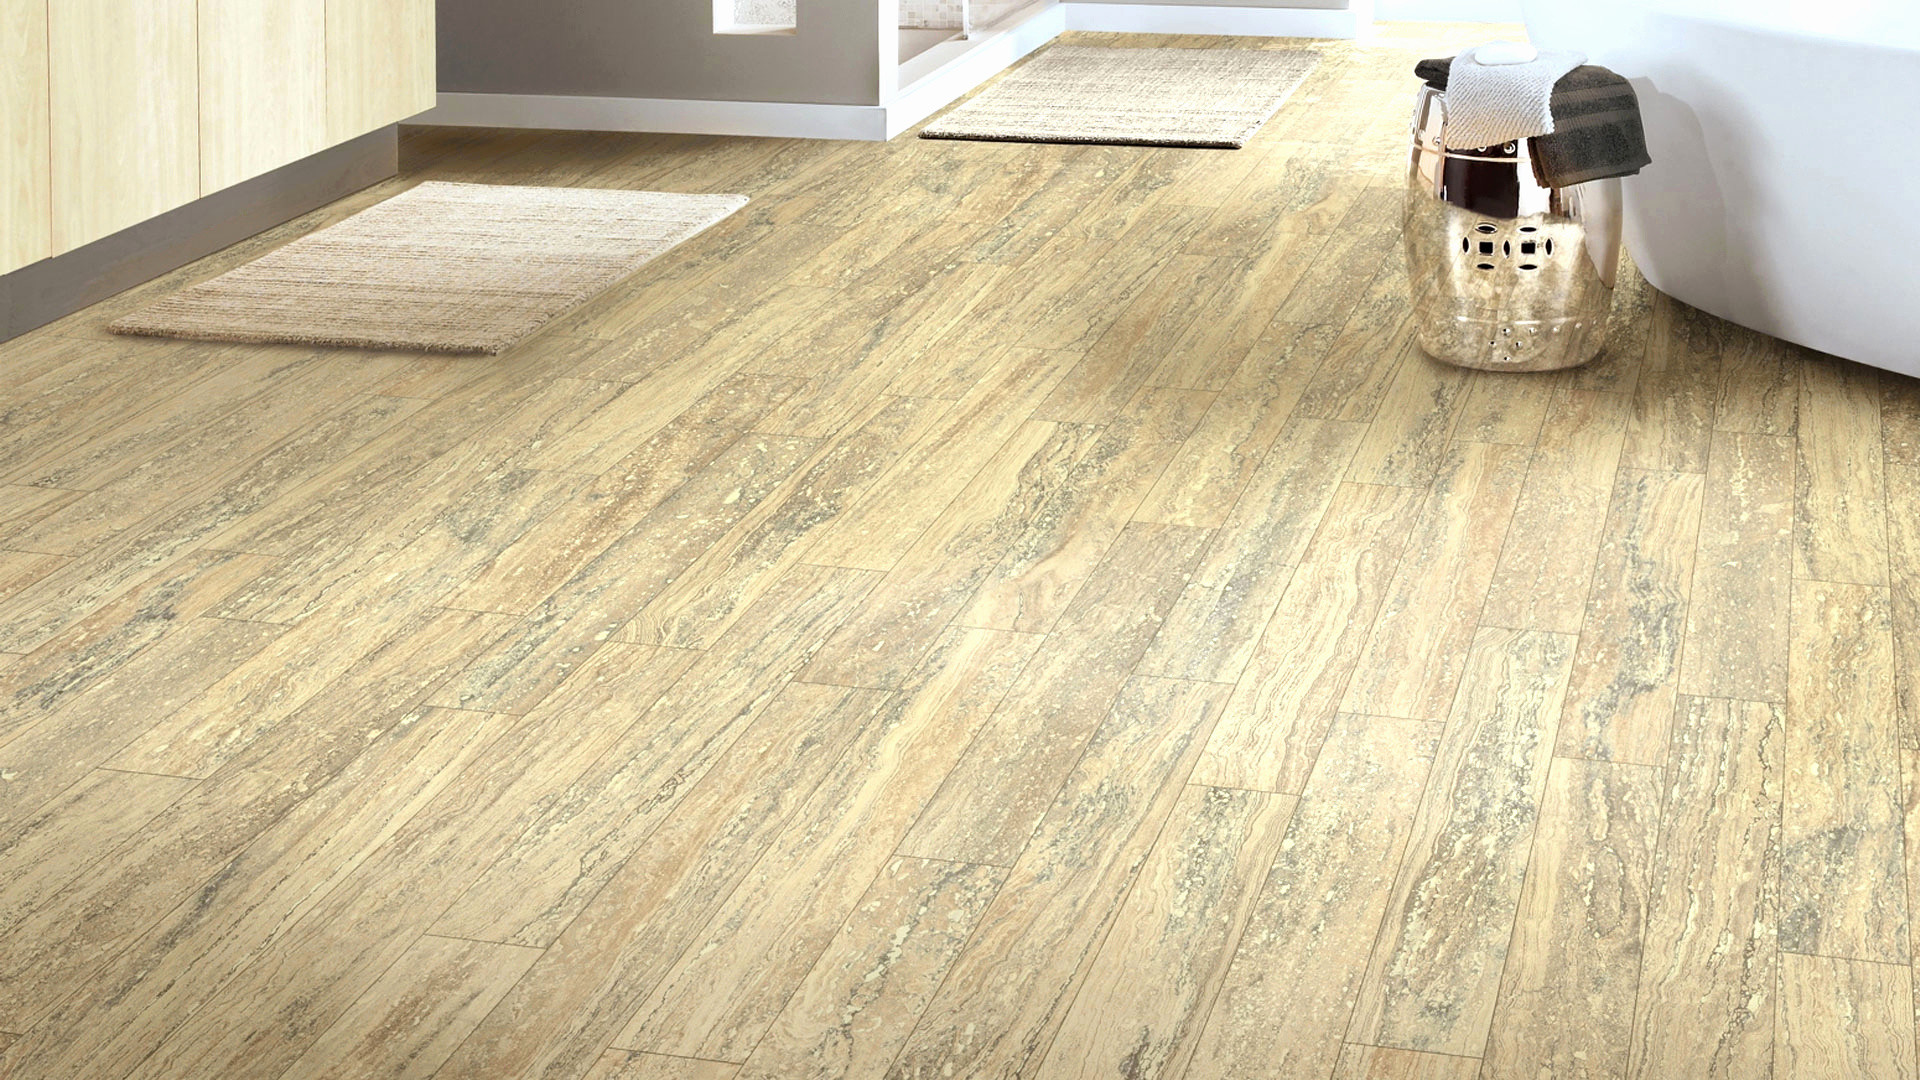 26 Famous Zep Hardwood And Laminate Floor Cleaner Reviews Unique